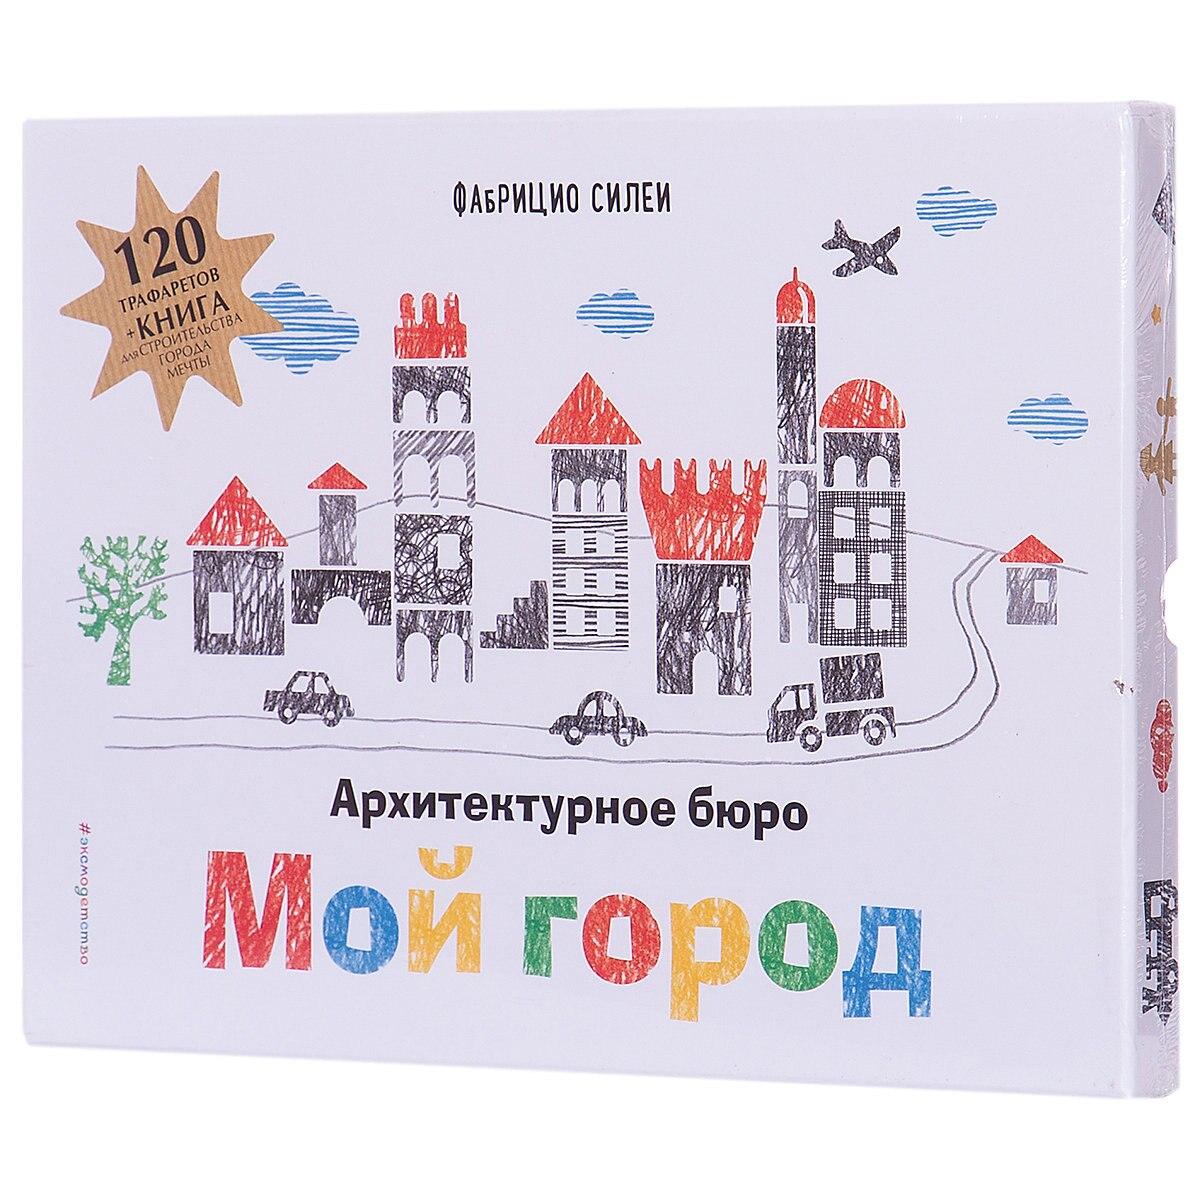 Books EKSMO 8676229 Children Education Encyclopedia Alphabet Dictionary Book For Baby MTpromo